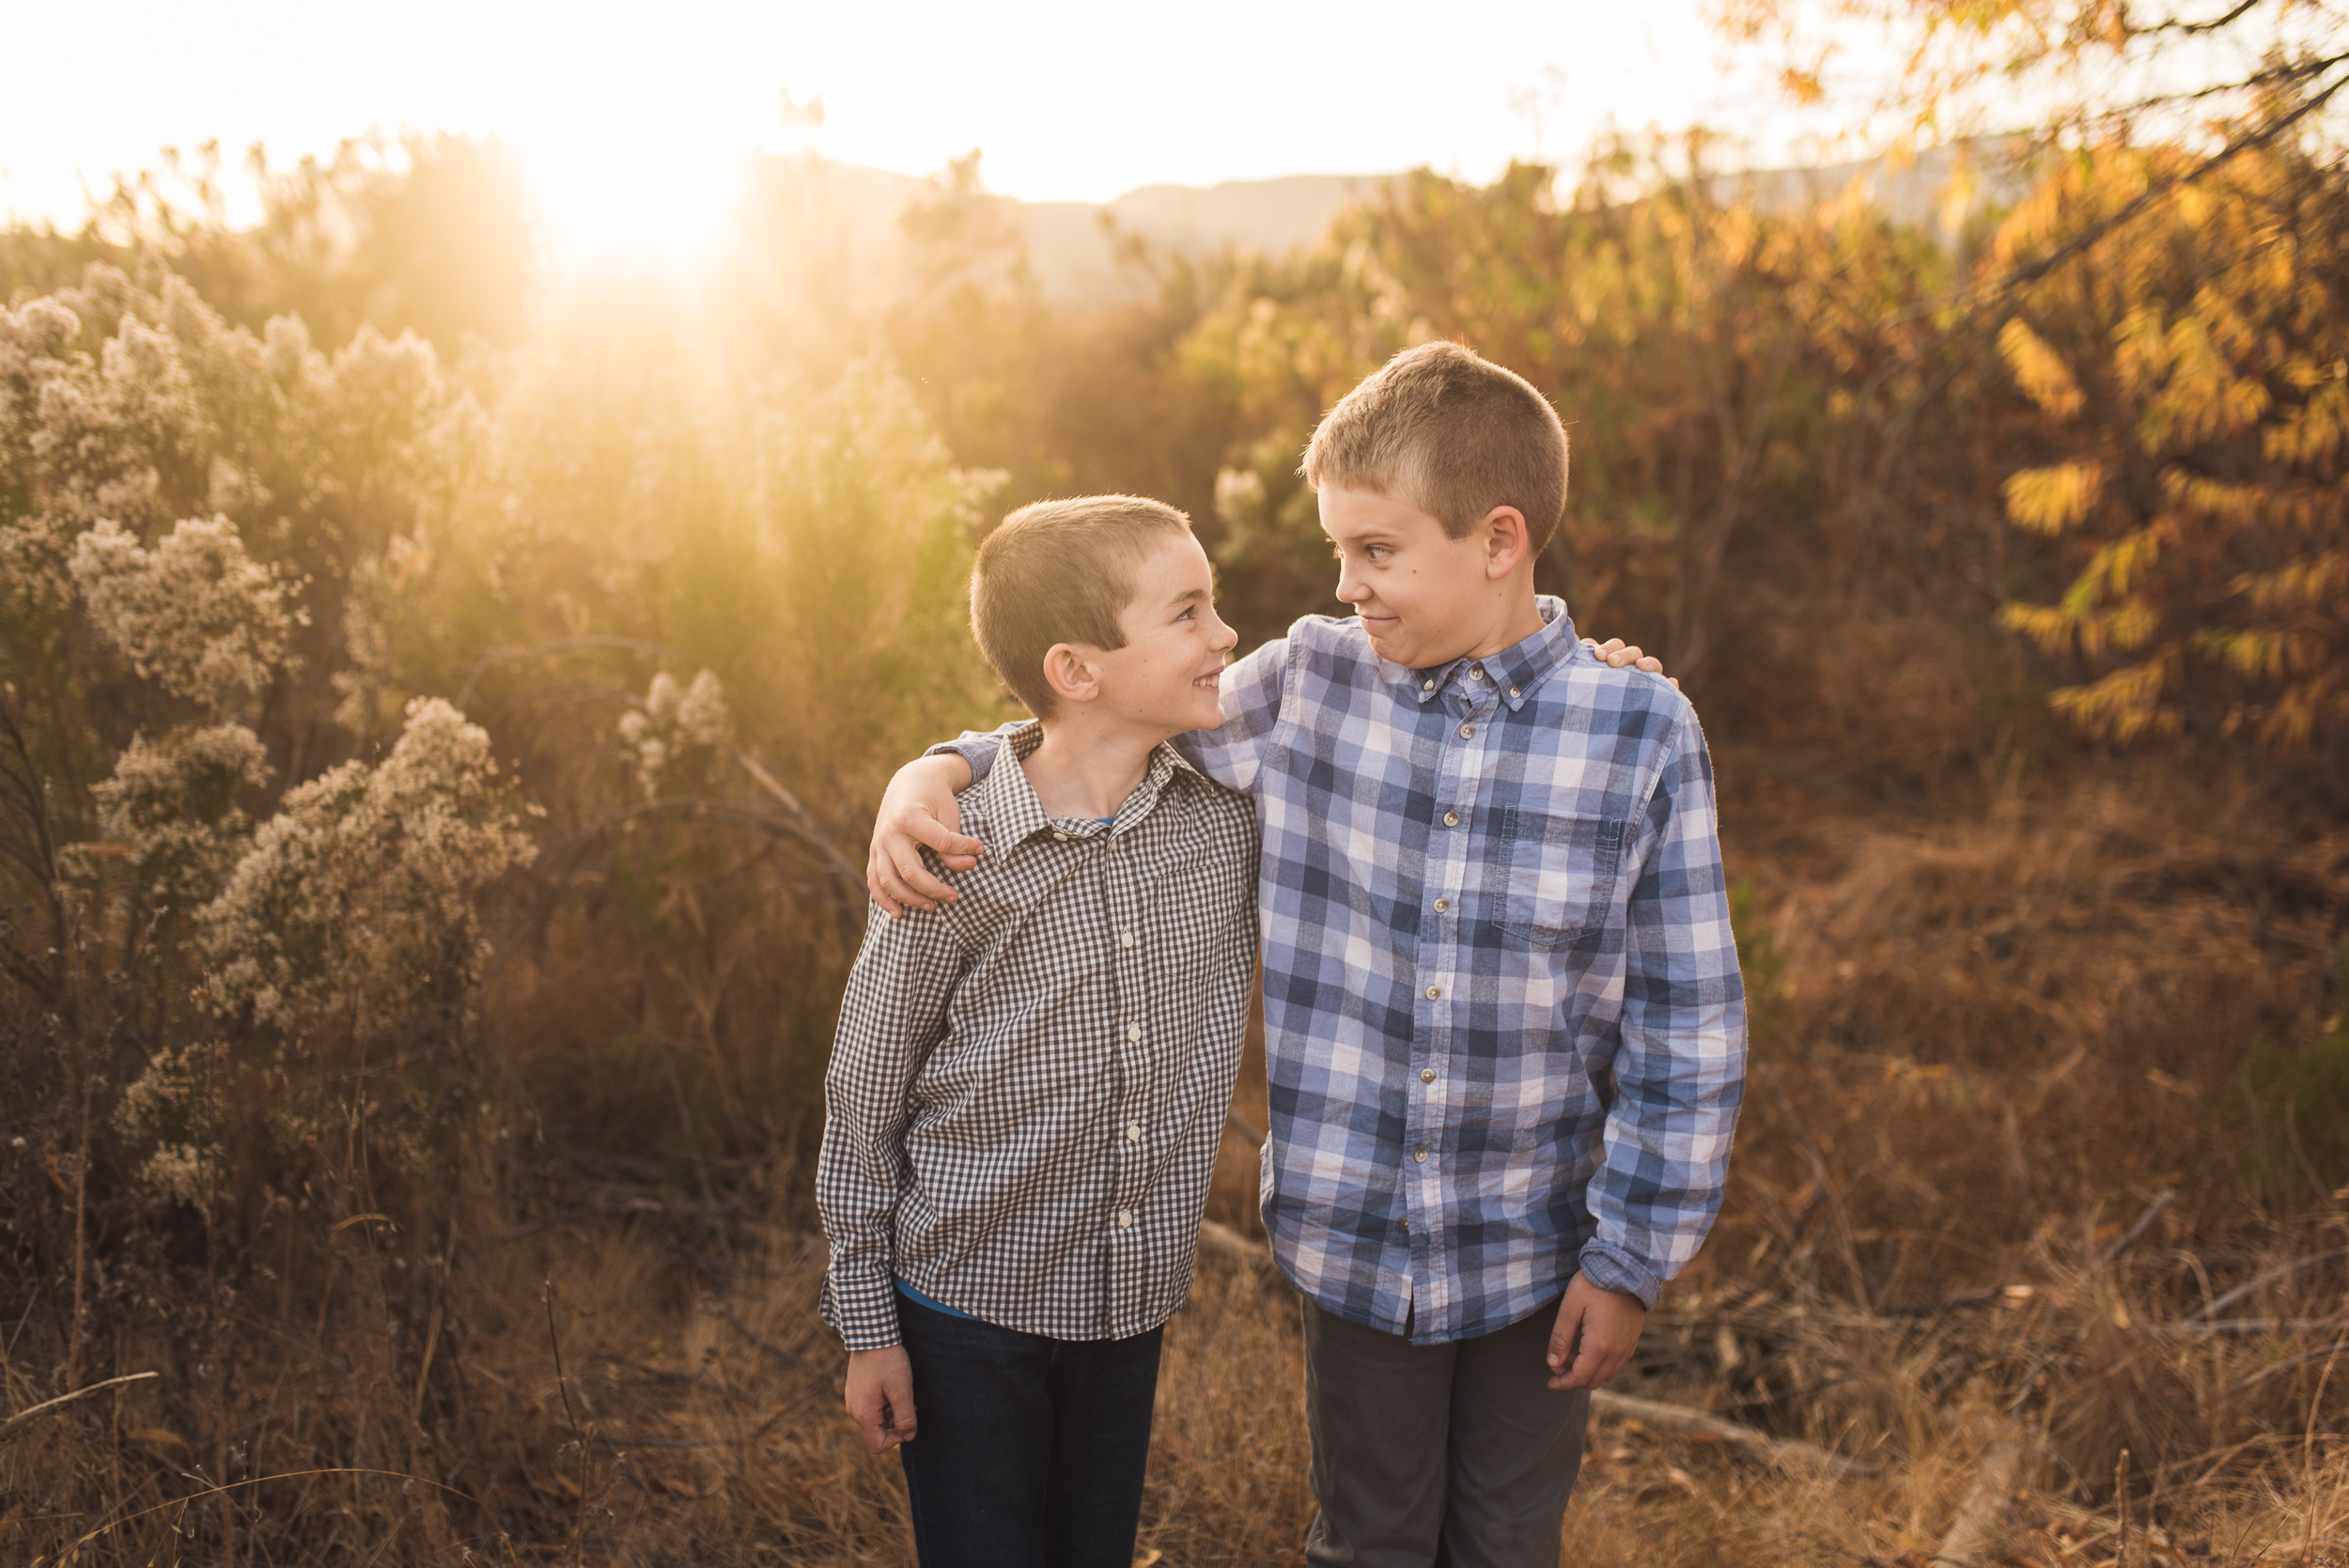 2018-San-Diego-Family-Lifestyle-Newborn-Travel-Vacation-Photographer-Kelsey-Smith-Photography-Coronado-La-Jolla-Encinitas-Solana-Beach-Del-Mar-141.jpg